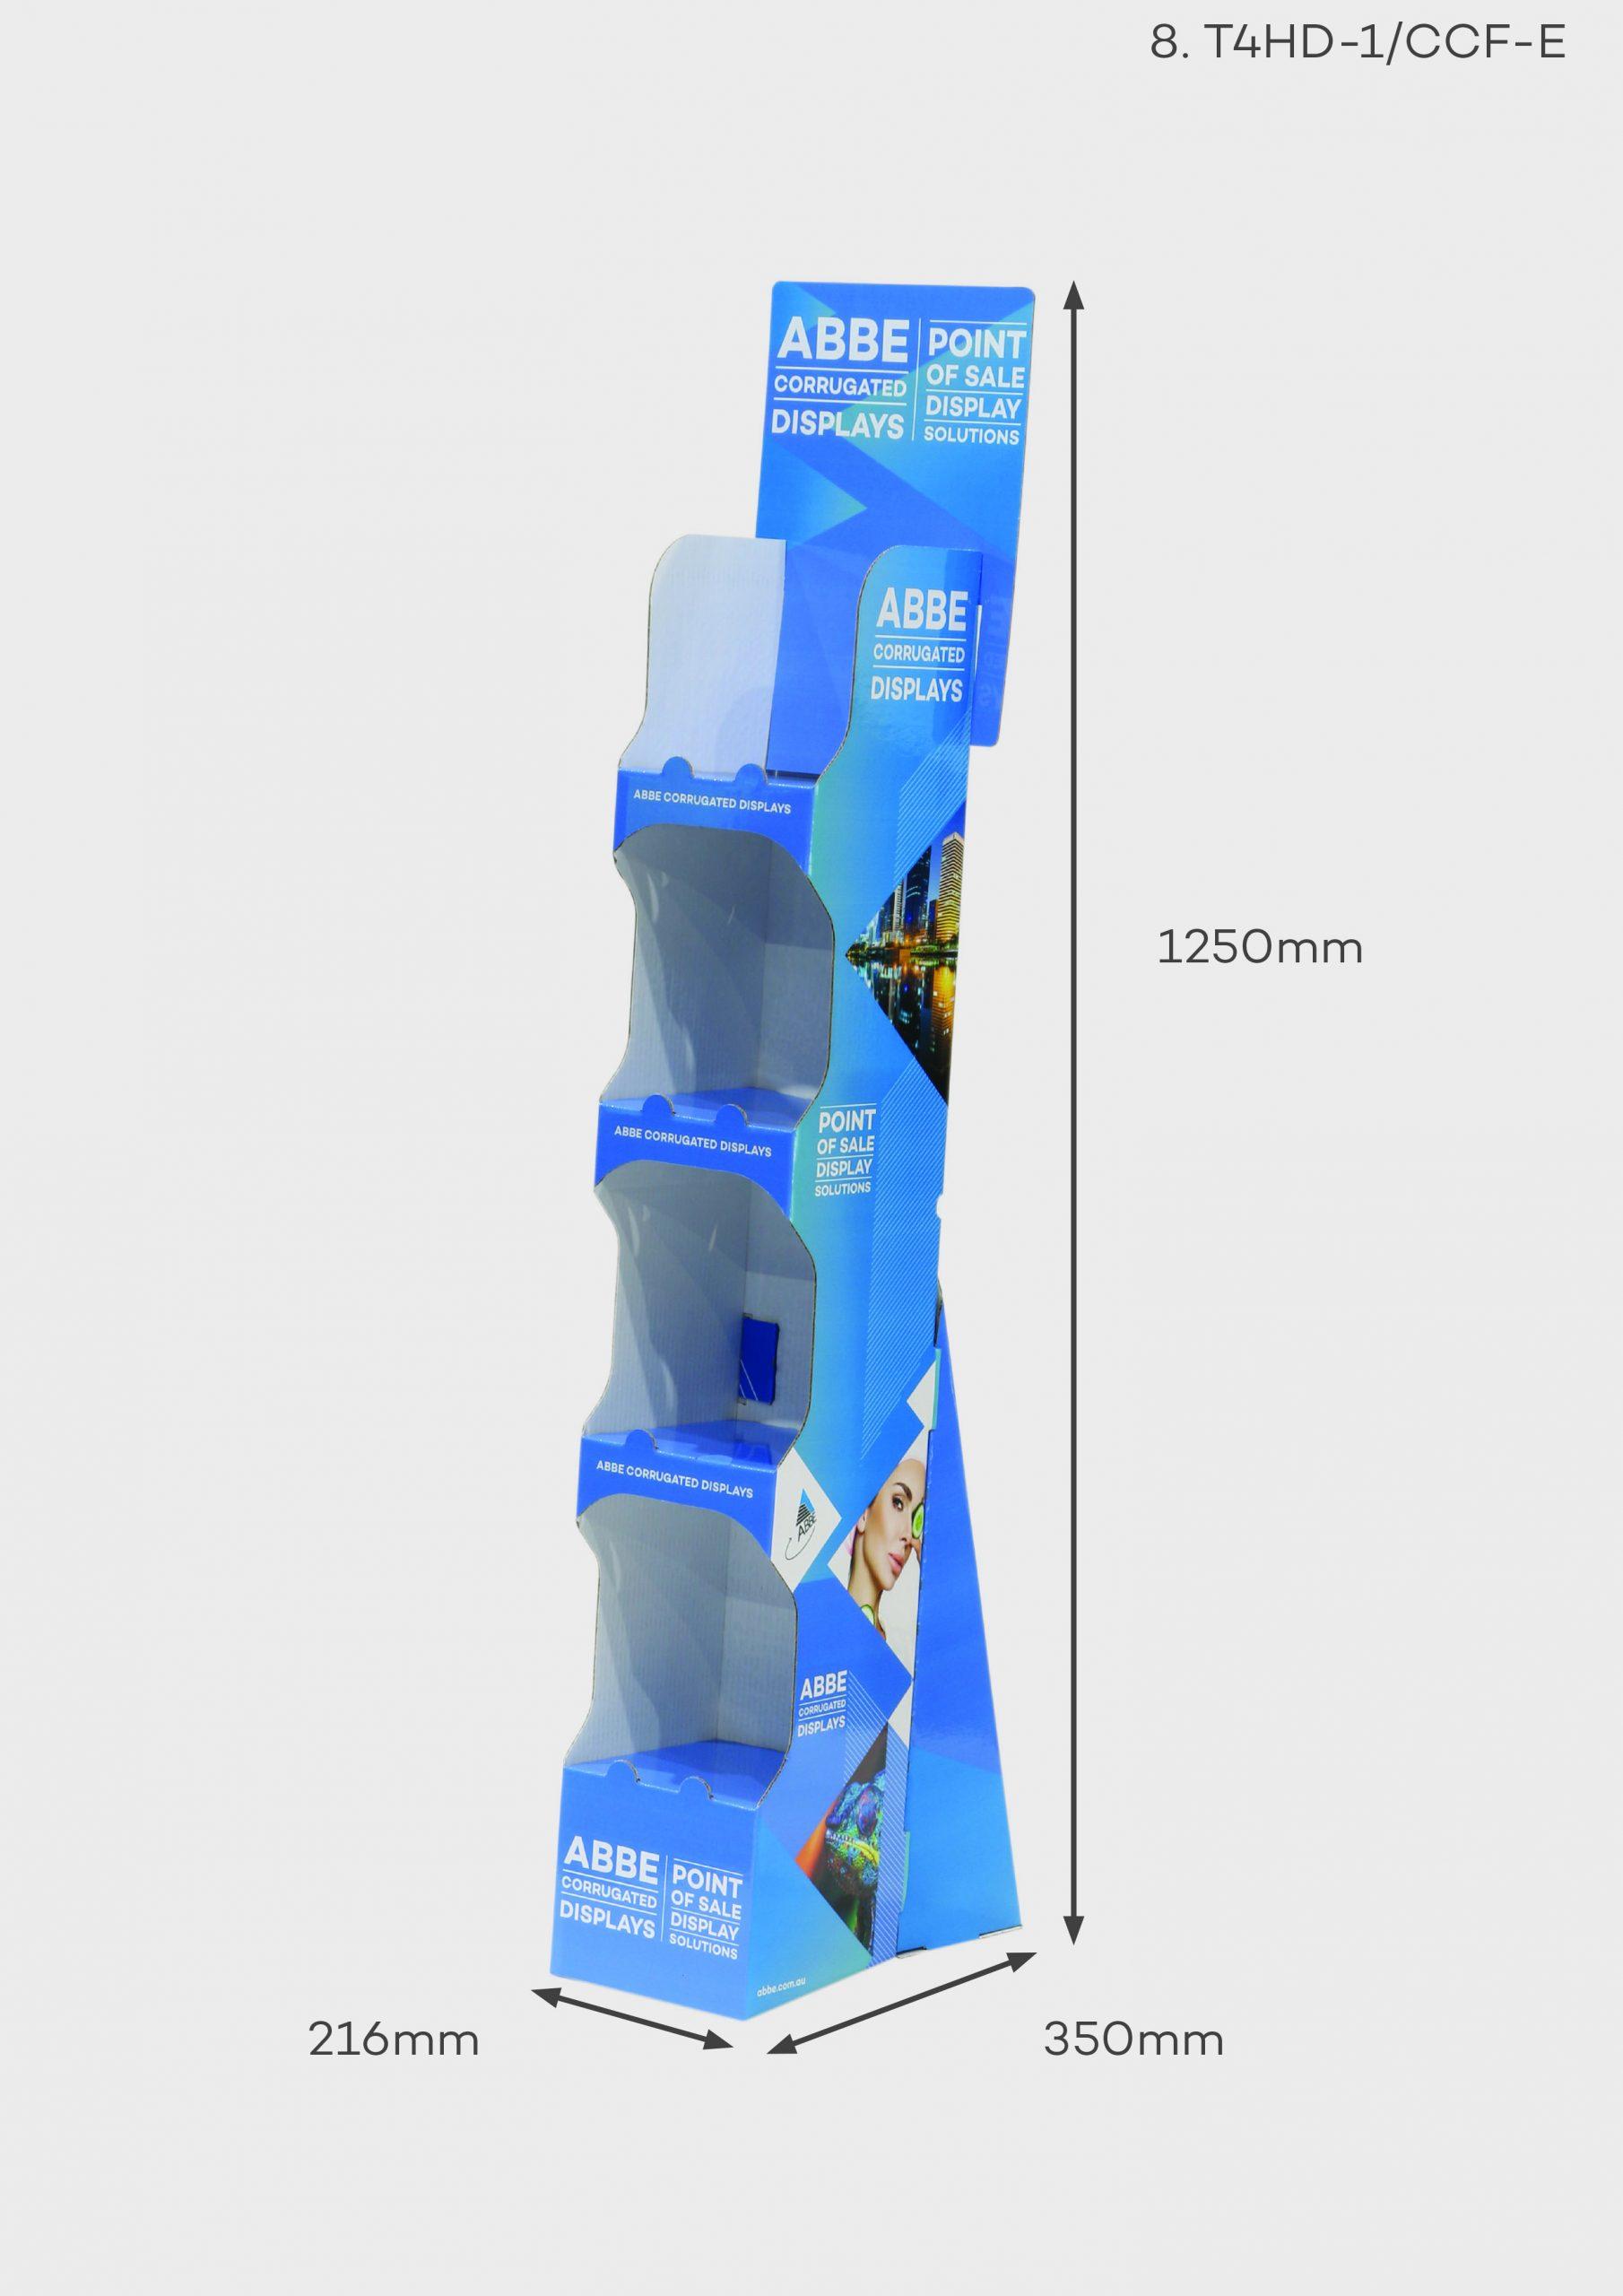 4 Shelf Slimline Convenience/Pharmacy Display (Ref T4HD-1/CCF-E